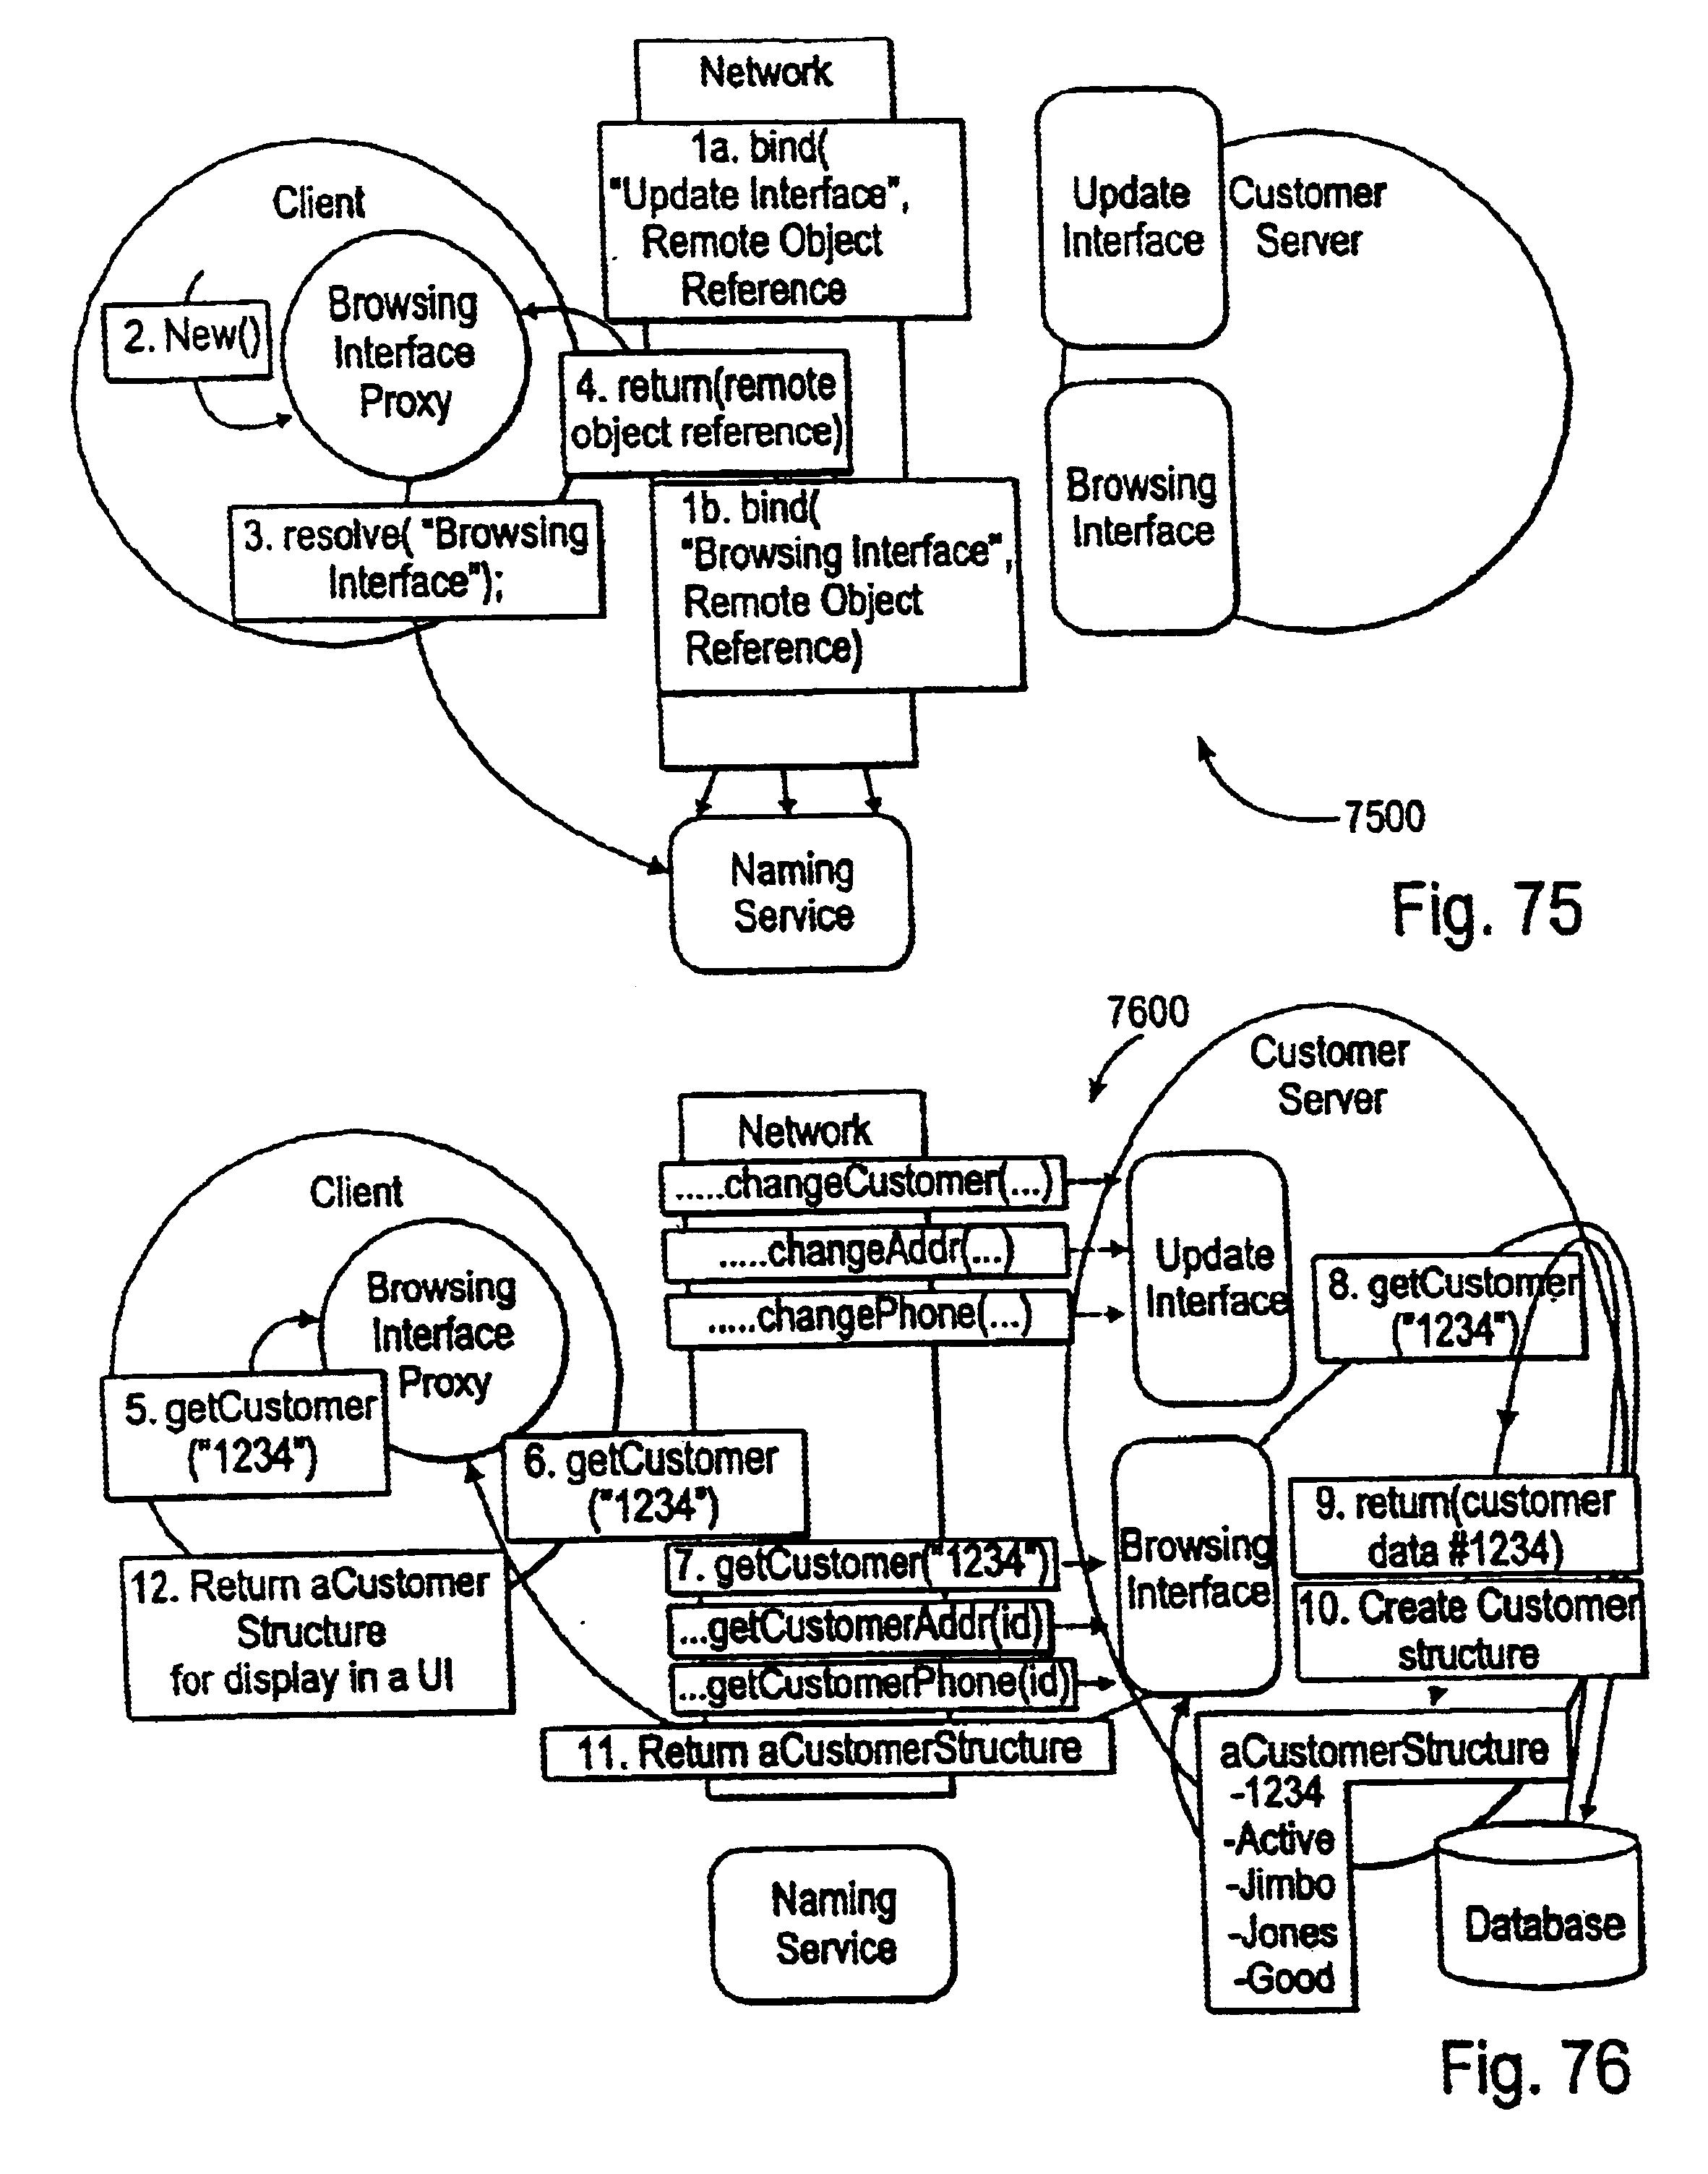 patent us 6 842 906 b1 Six Thinking Hats Diagram patent images